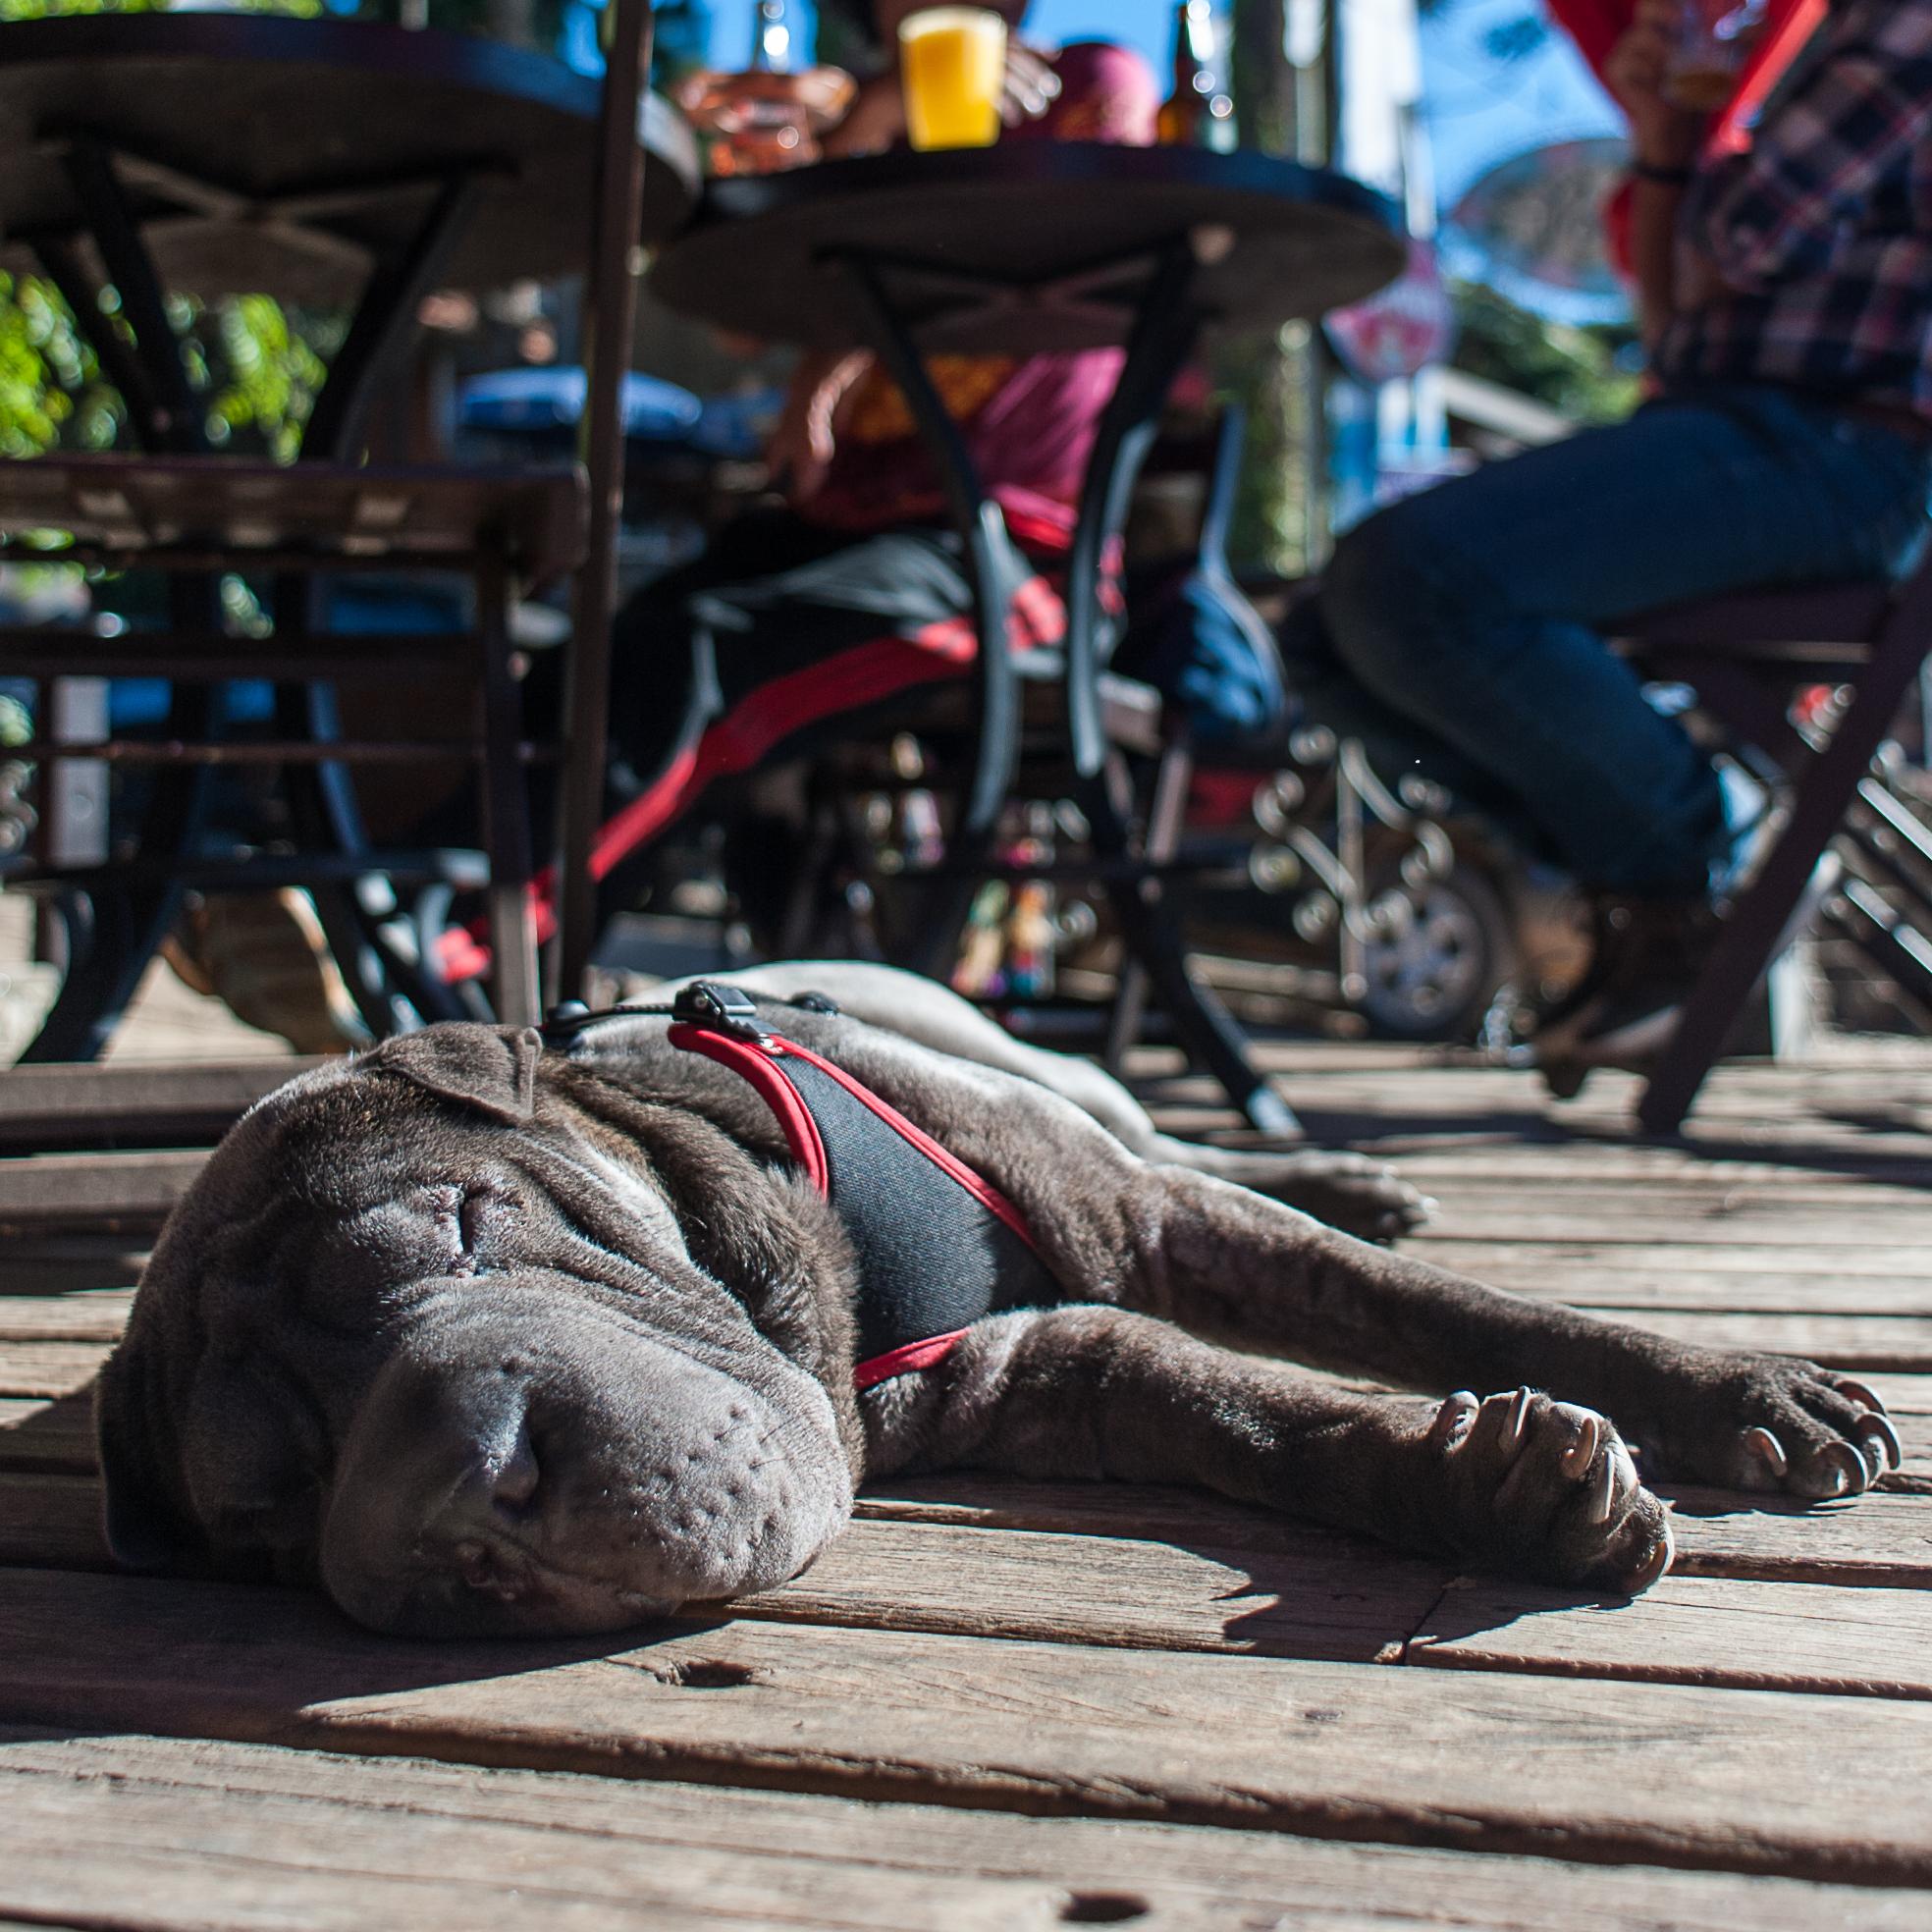 cachorro deitado tomando sol